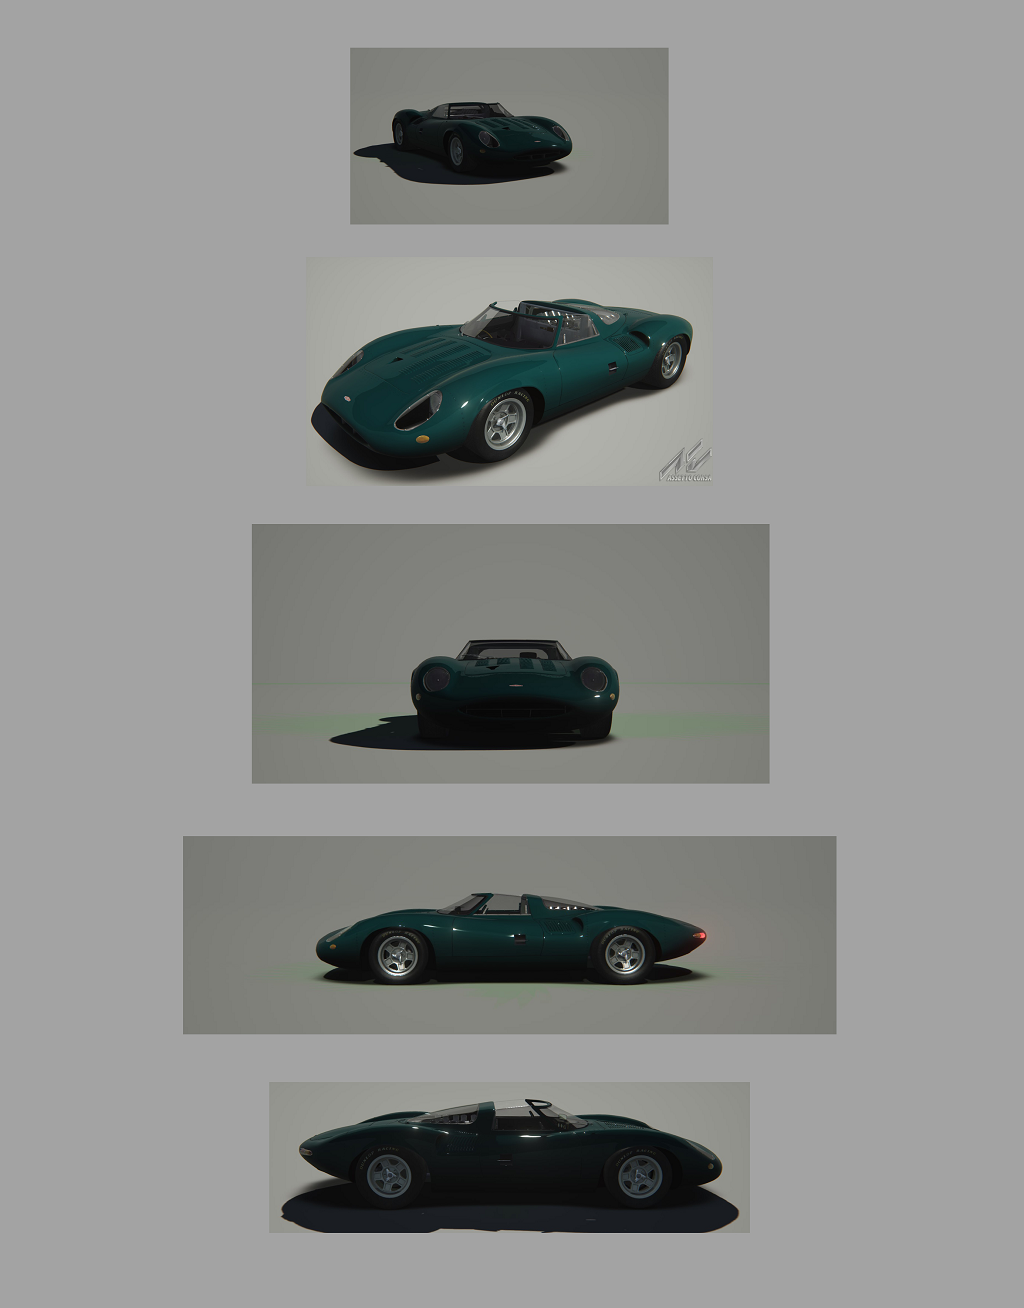 Assetto Corsa - Jaguar XJ13 Mod and Video 3.png